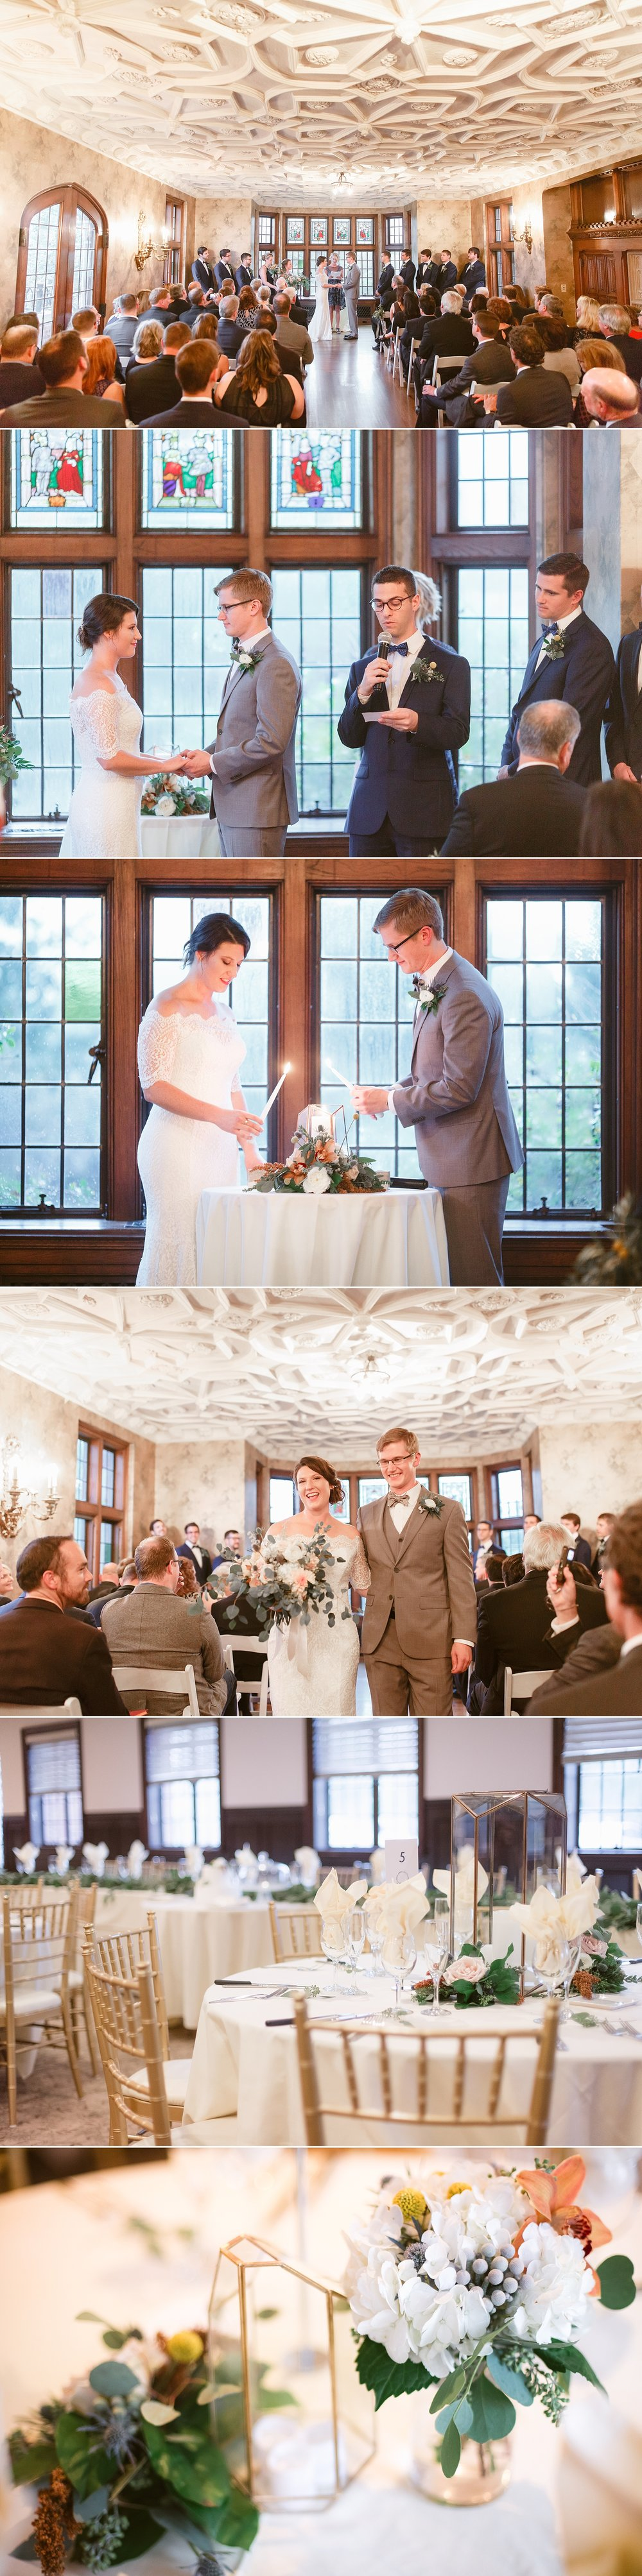 Midwest fine art wedding Des Moines Fall Wedding photographer_0300.jpg